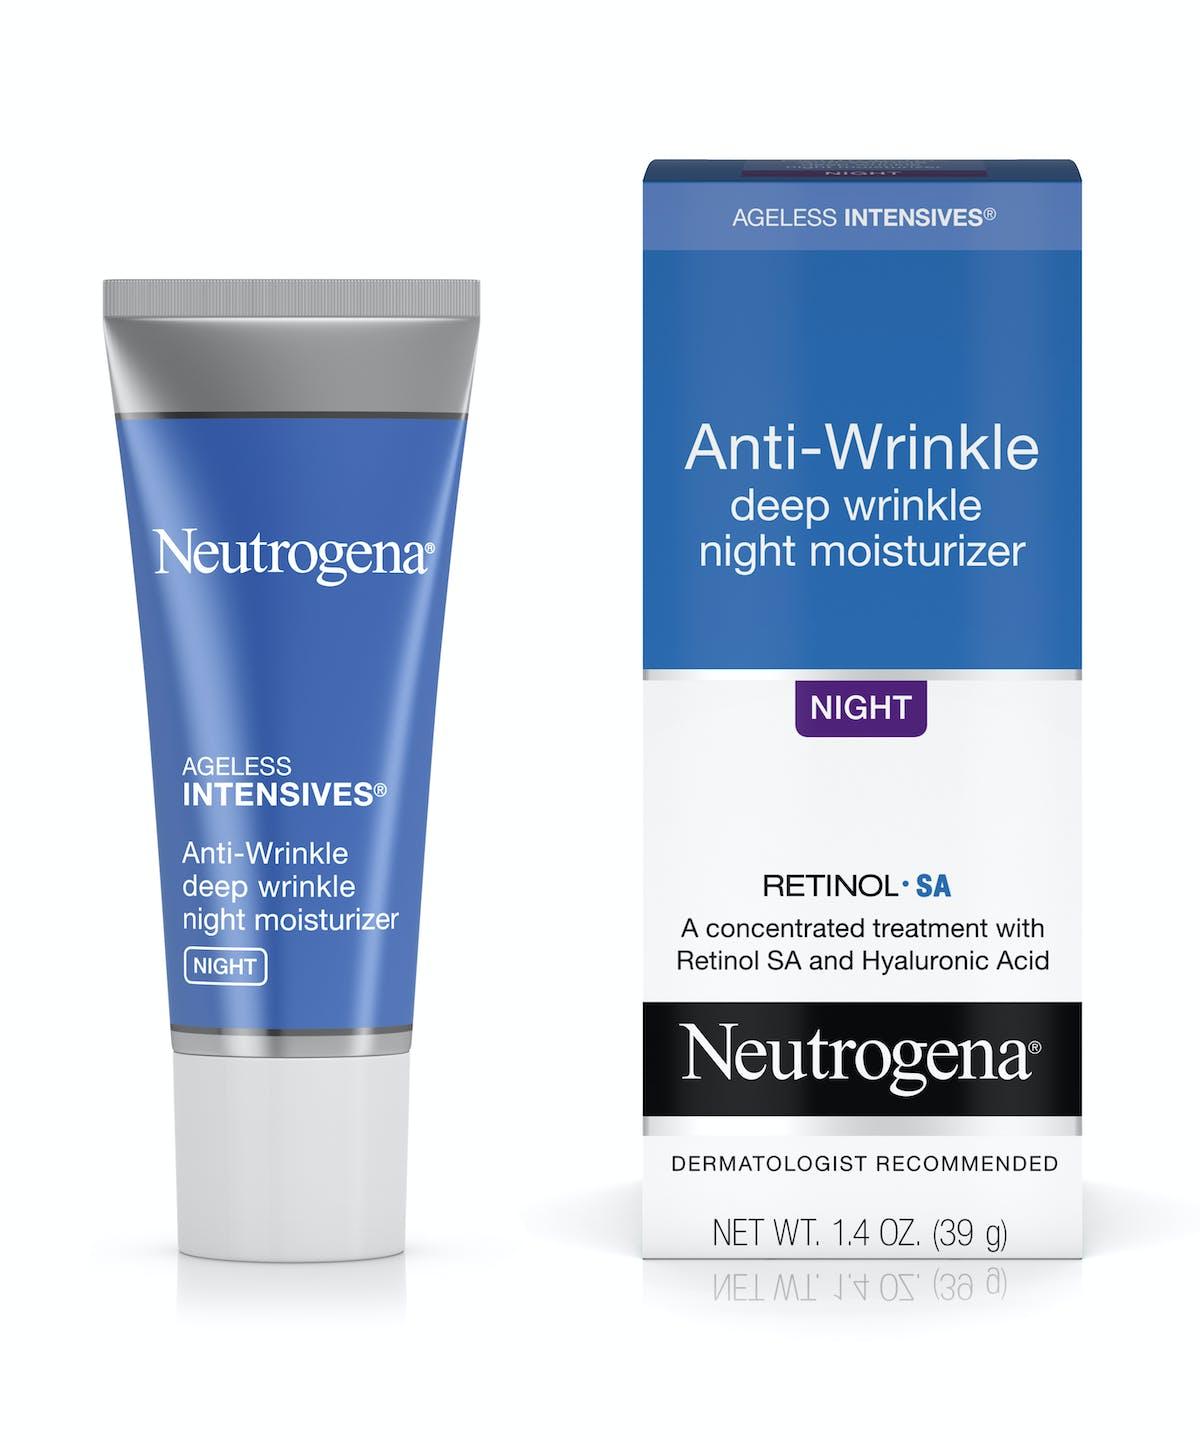 Ageless Intensives® Anti-Wrinkle Deep Wrinkle Night Moisturizer